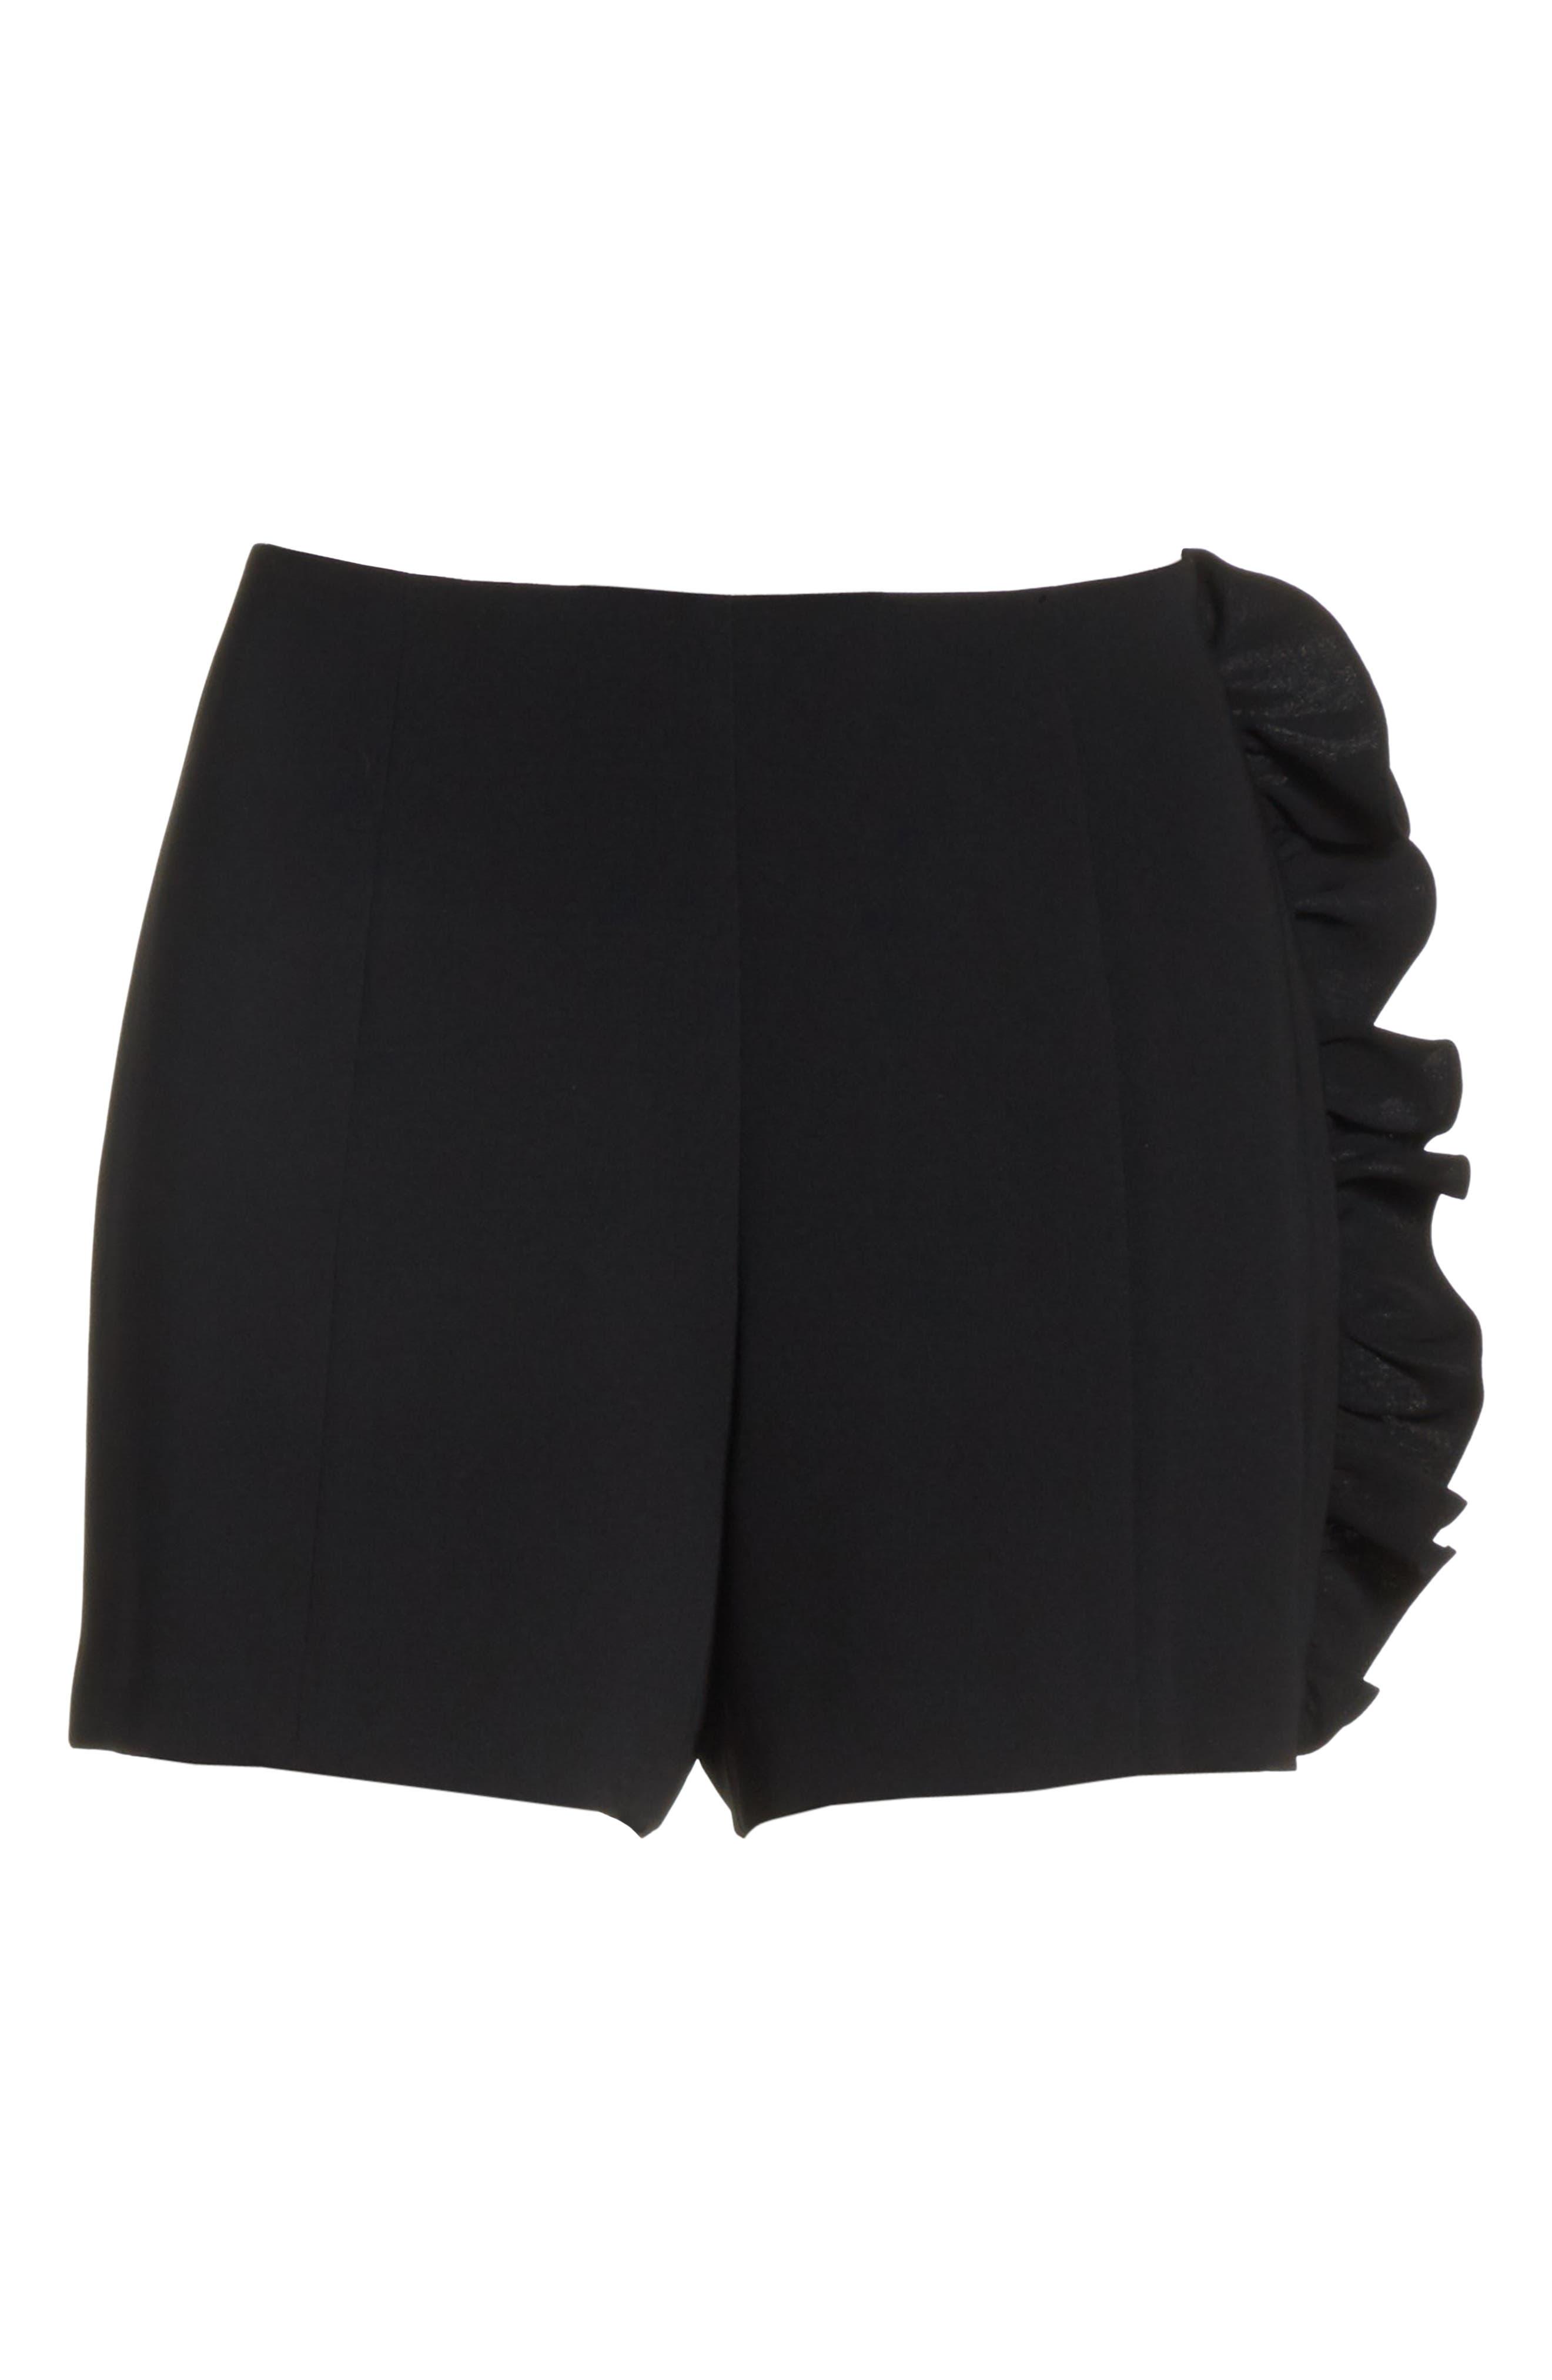 Kenzie Ruffle Side Shorts,                             Alternate thumbnail 6, color,                             001